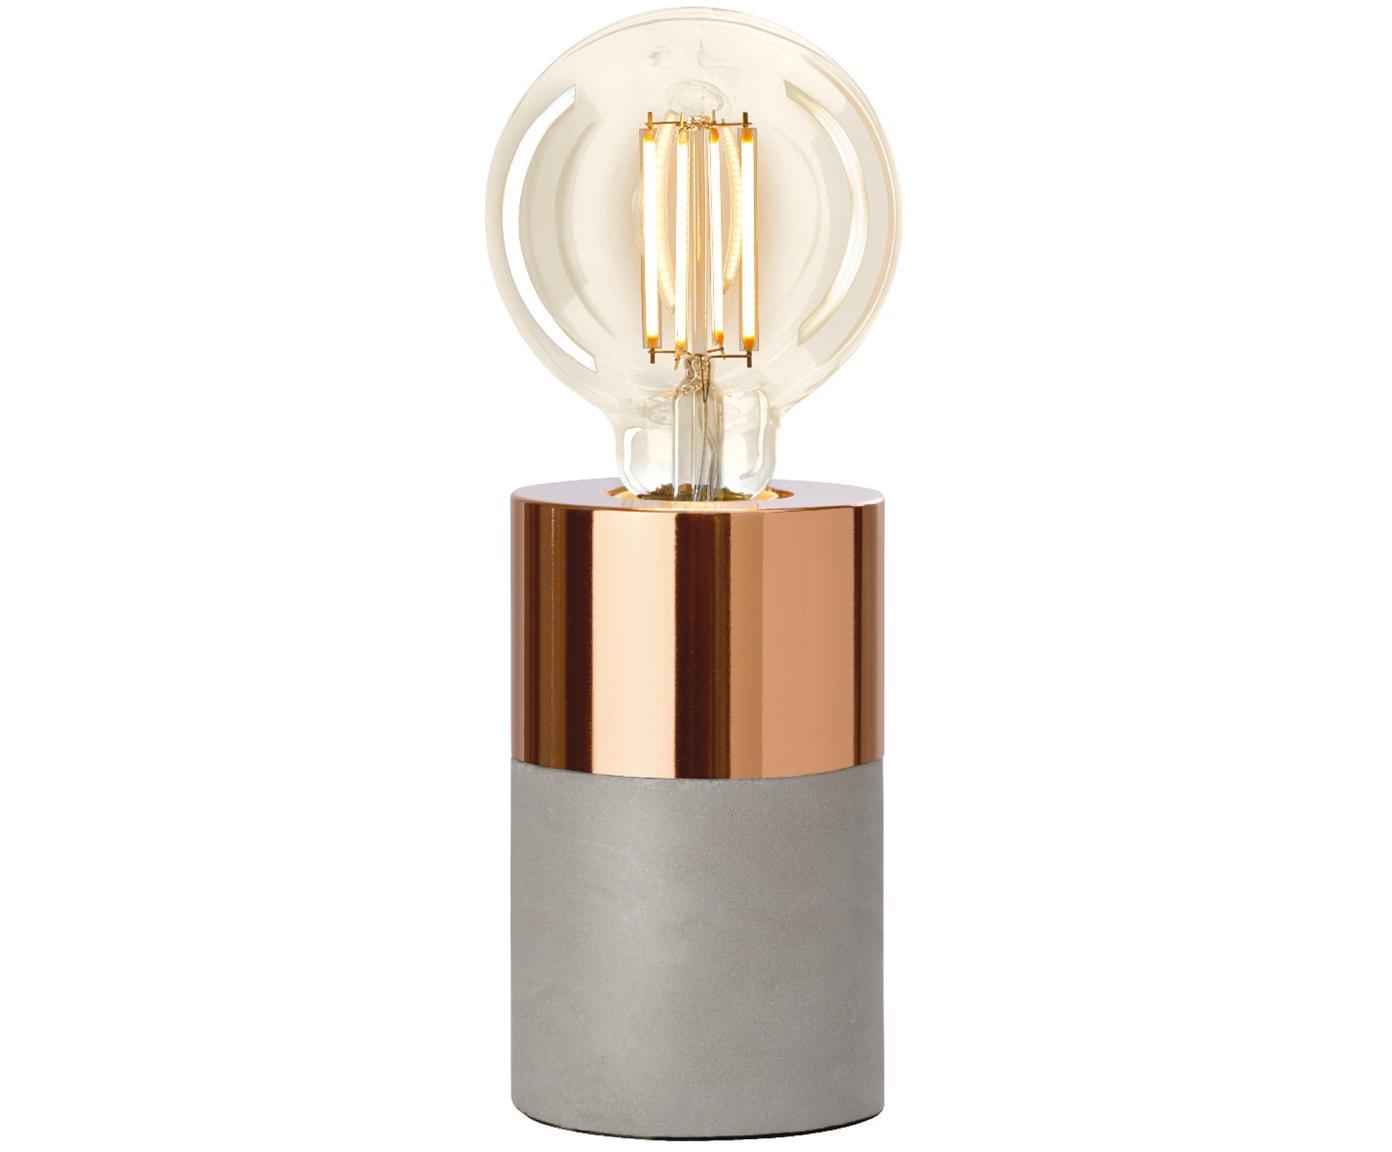 Lampada da tavolo Athen, Grigio, rame, Ø 8 x Alt. 14 cm